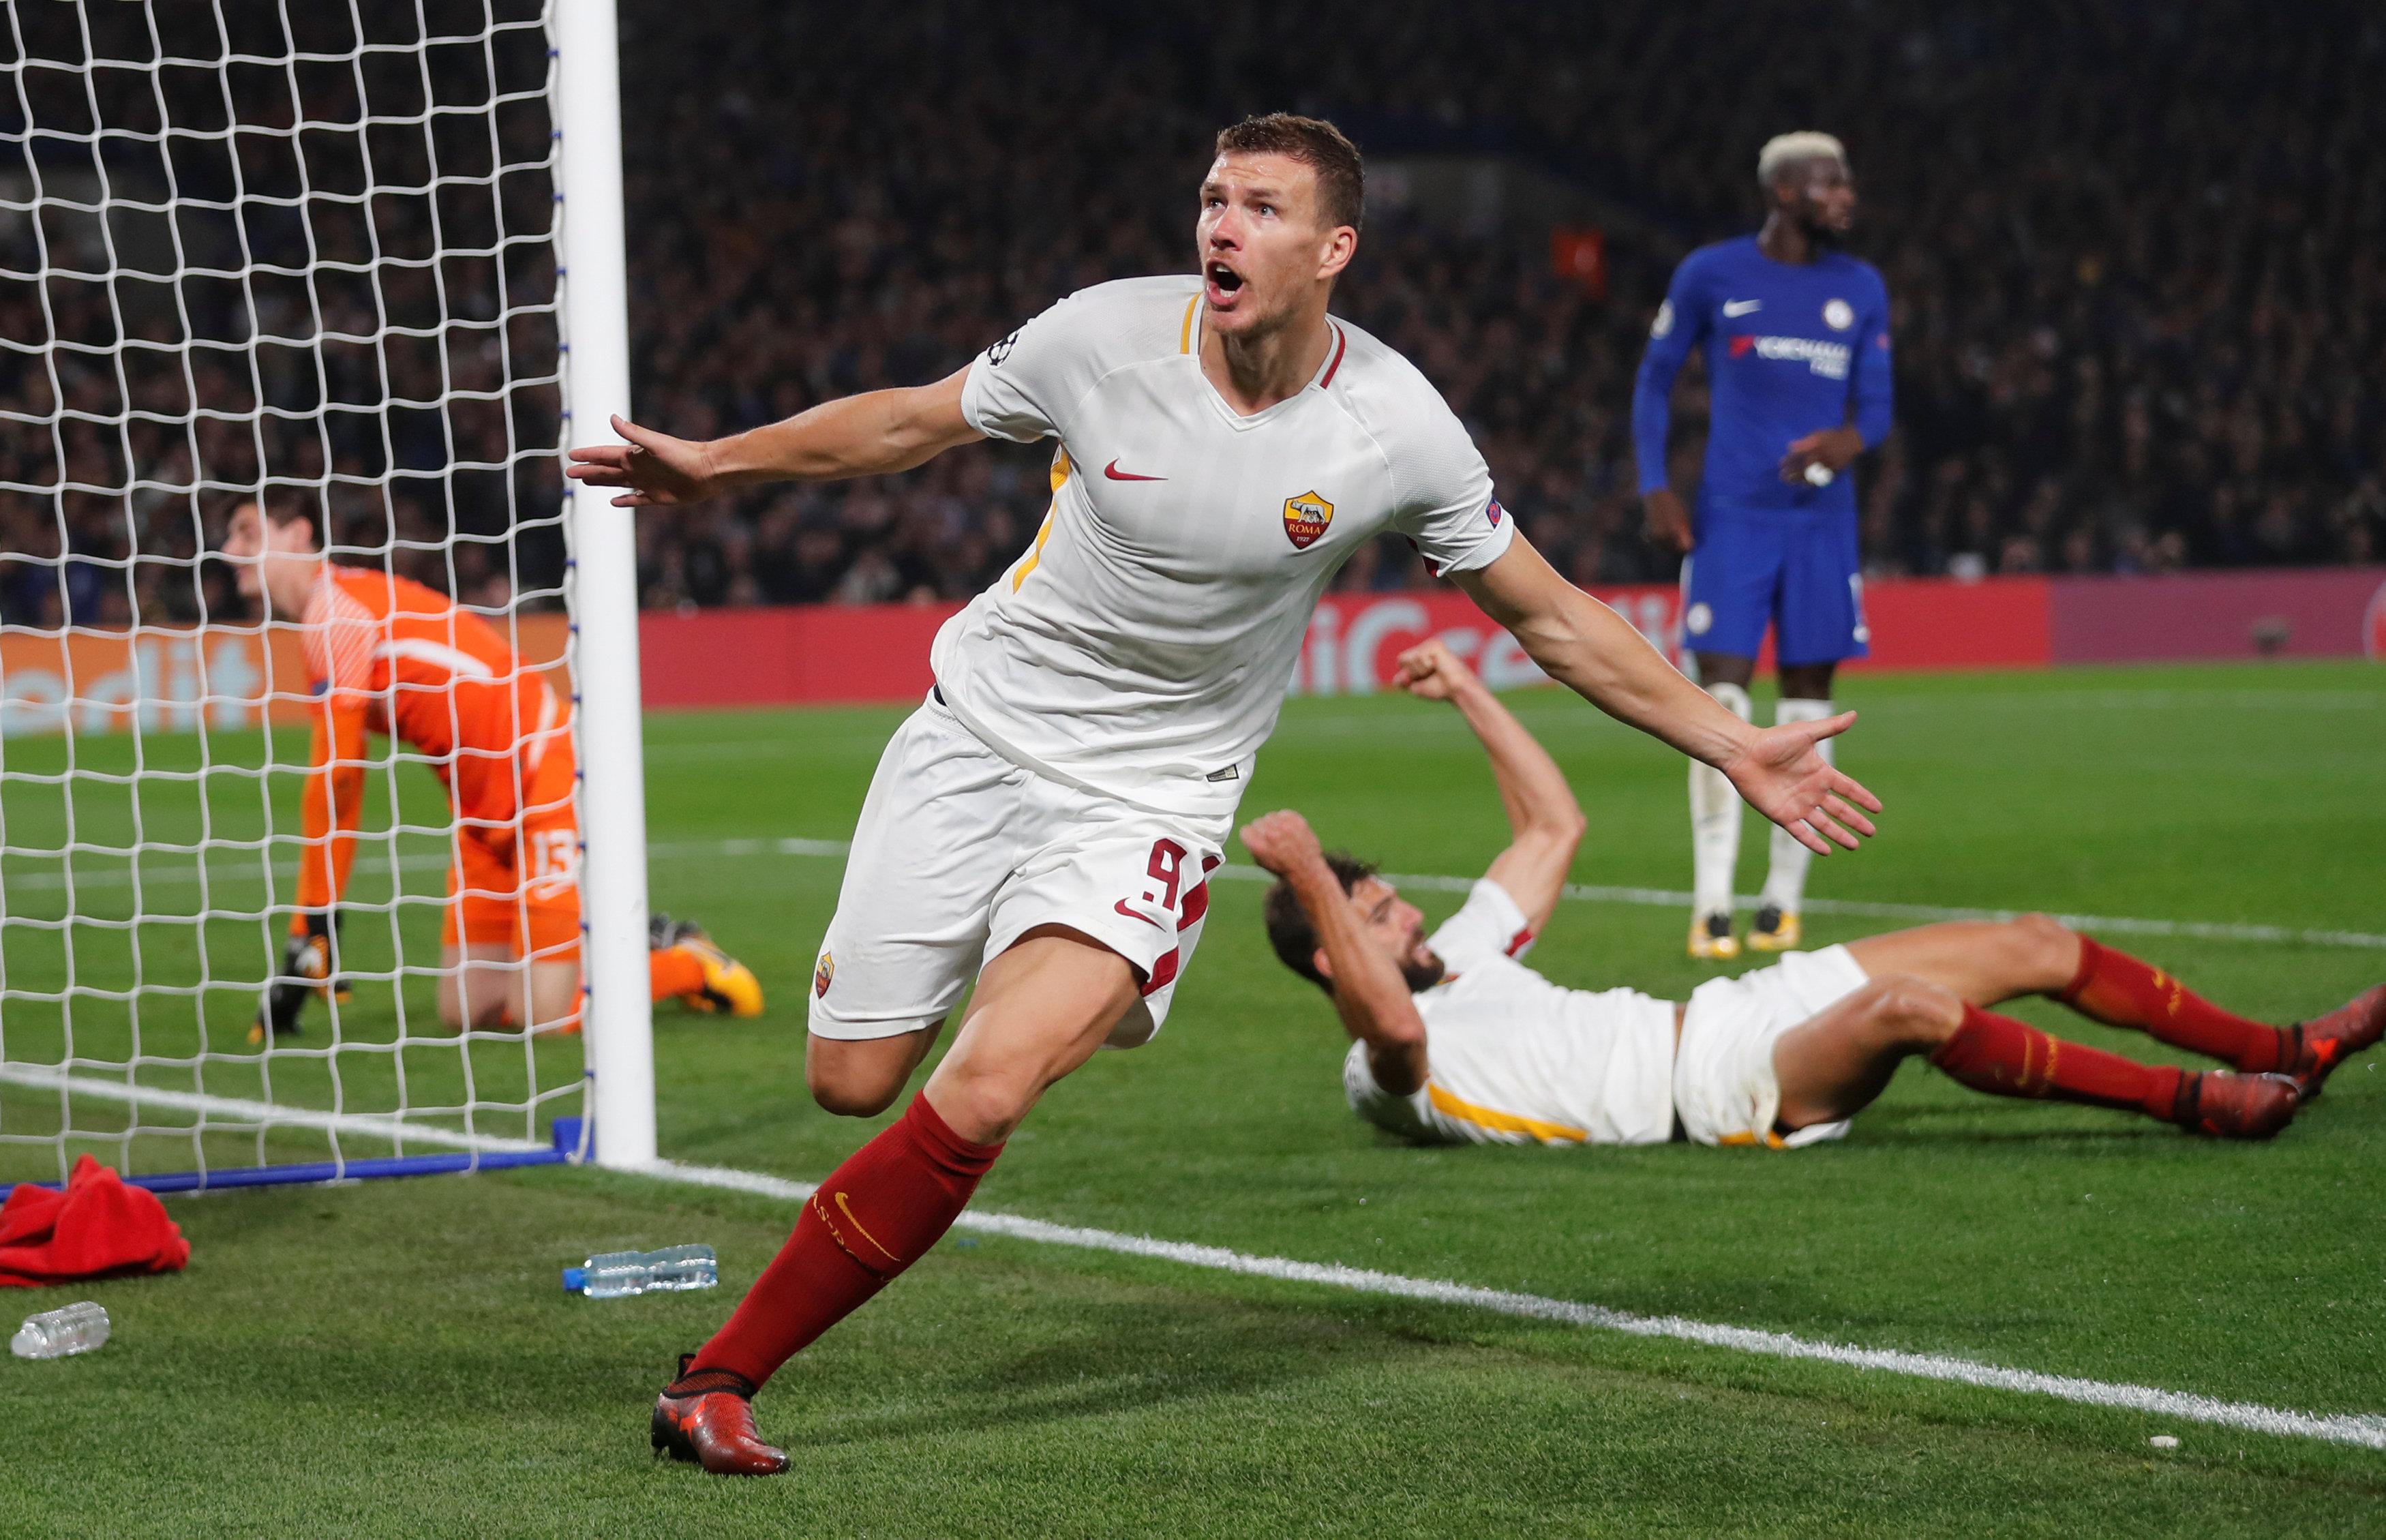 Soccer Football - Champions League - Chelsea vs AS Roma - Stamford Bridge, London, Britain - October 18, 2017   AS Roma's Edin Dzeko celebrates scoring their third goal                 REUTERS/Eddie Keogh